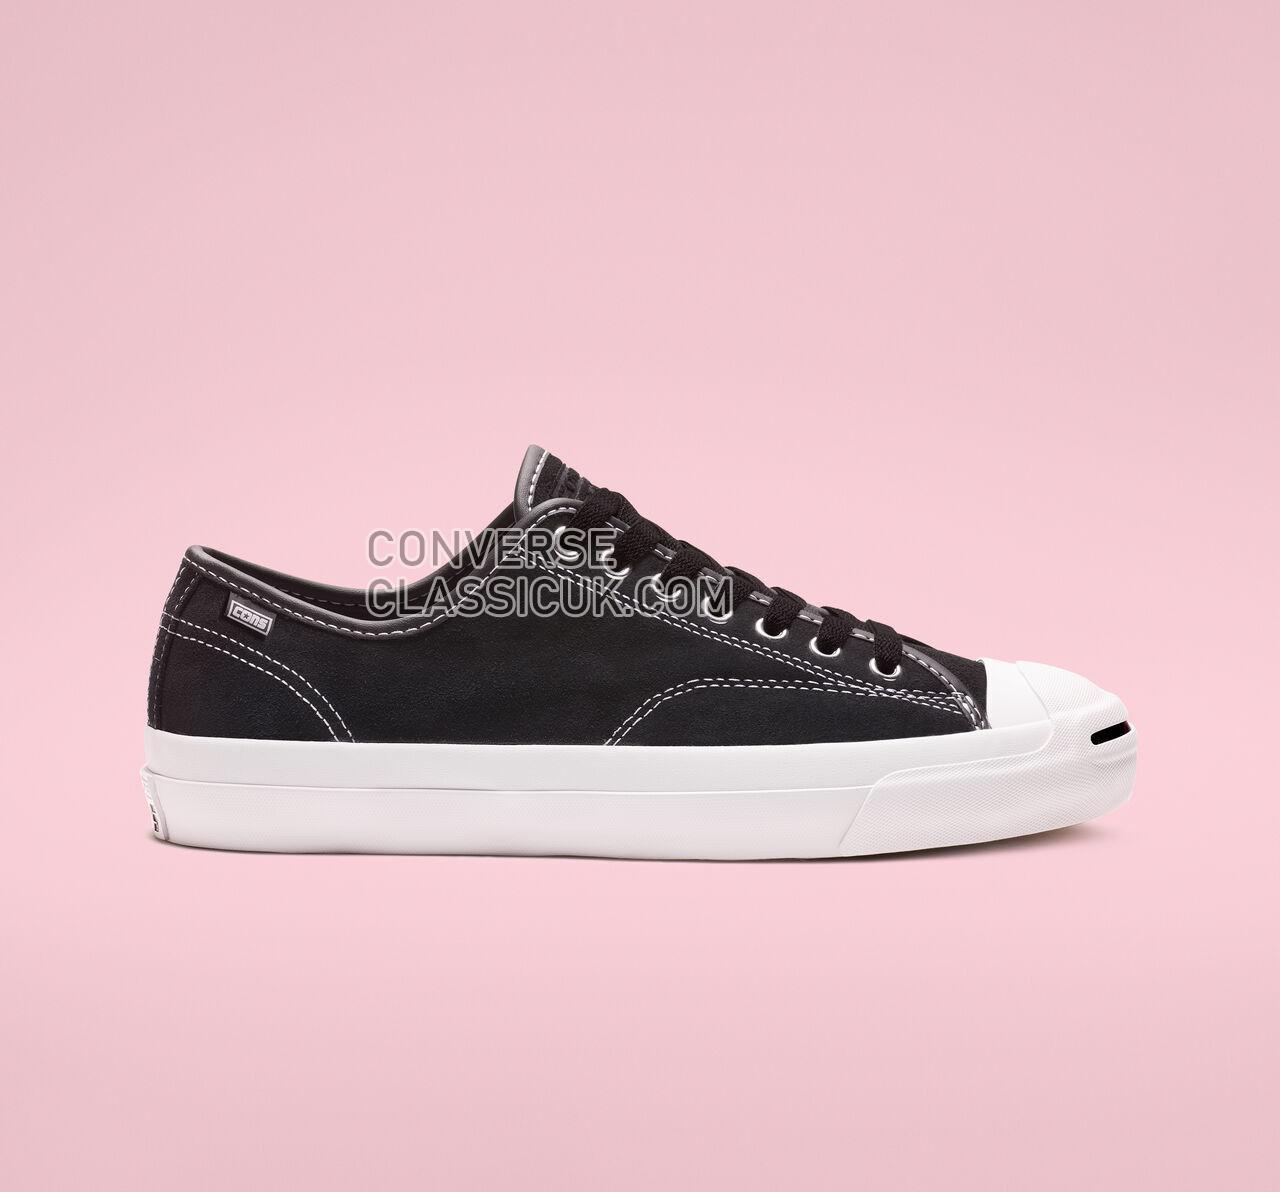 Converse Jack Purcell Pro Suede Low Top Mens Womens Unisex 159508C Black/Black/White Shoes